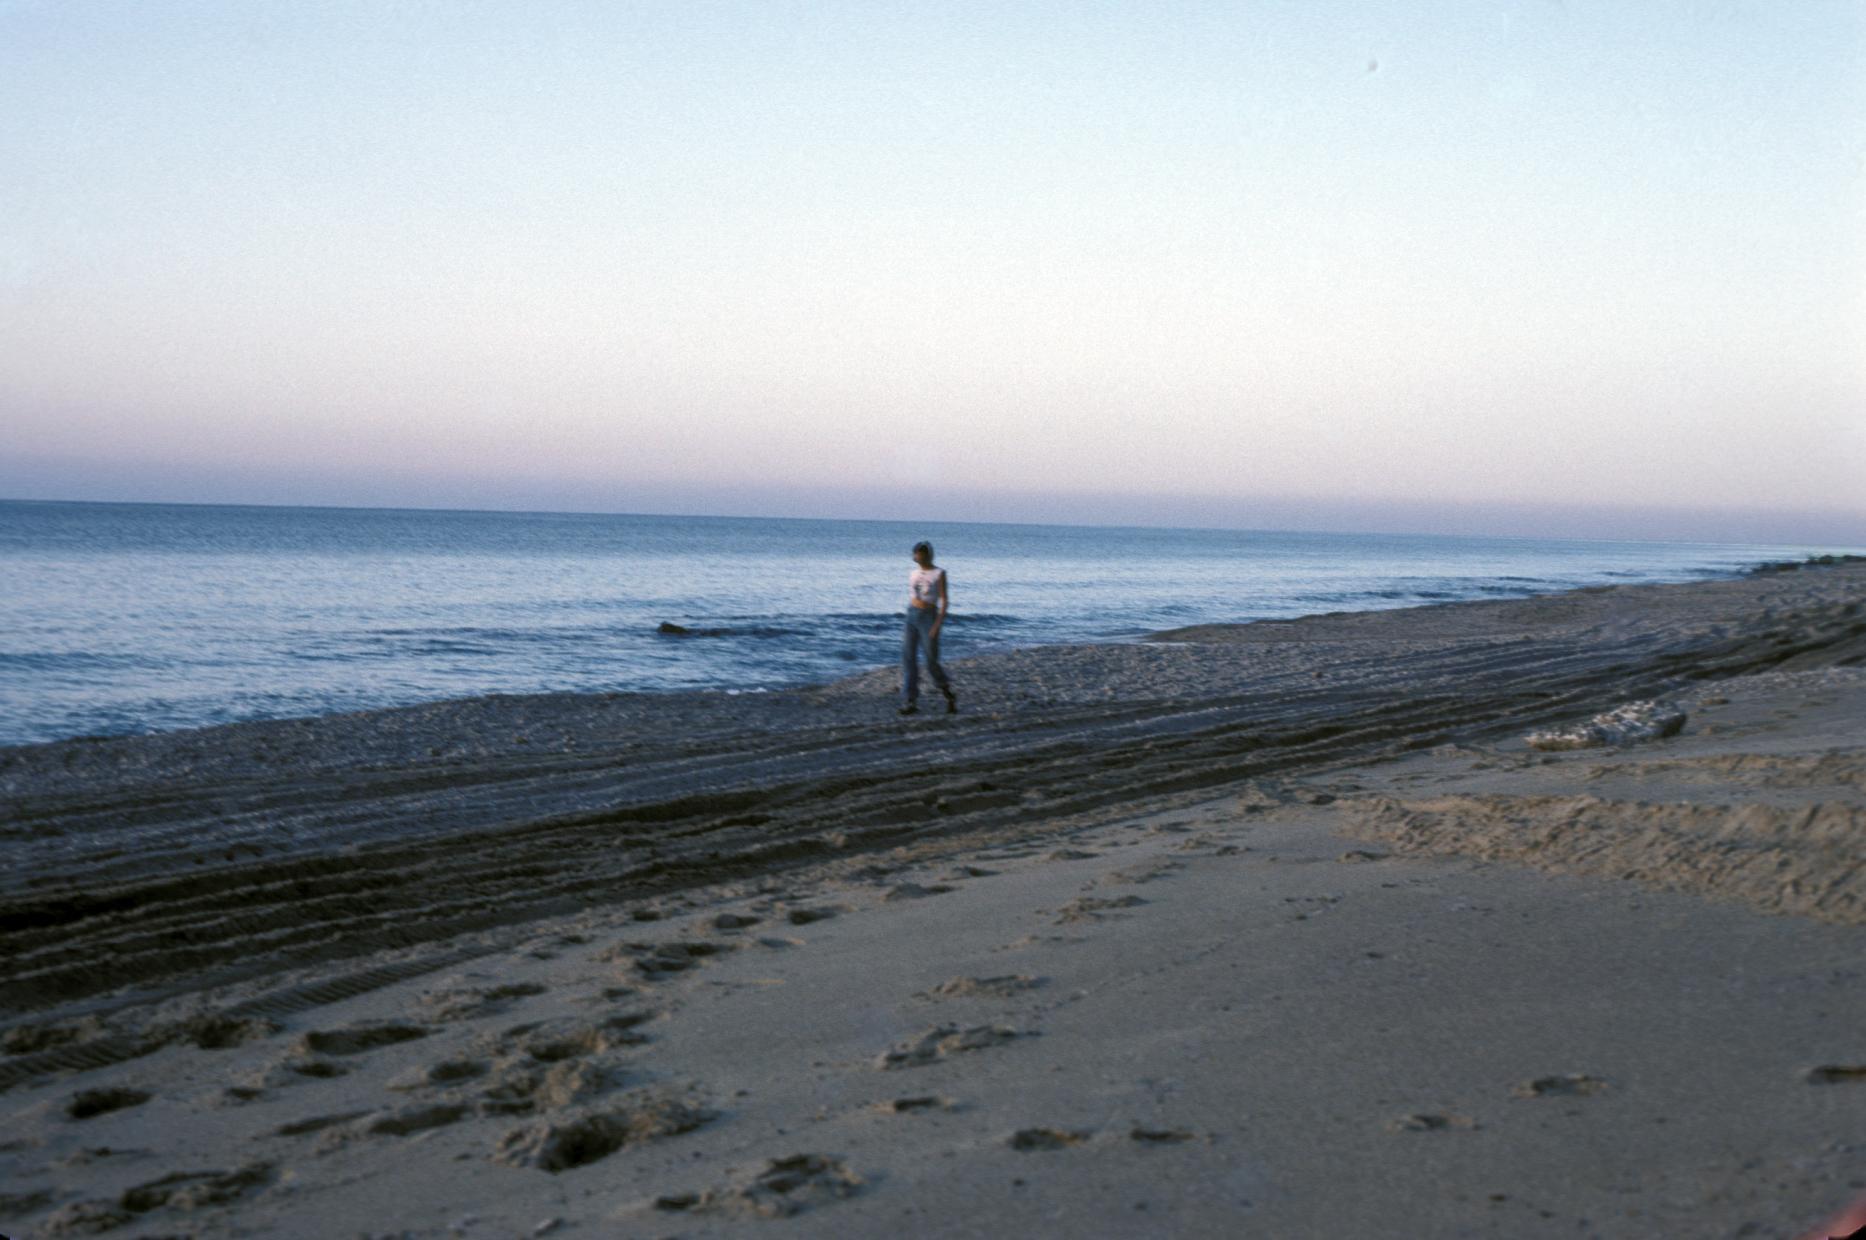 Breathe, and walk in peace even in turmoil